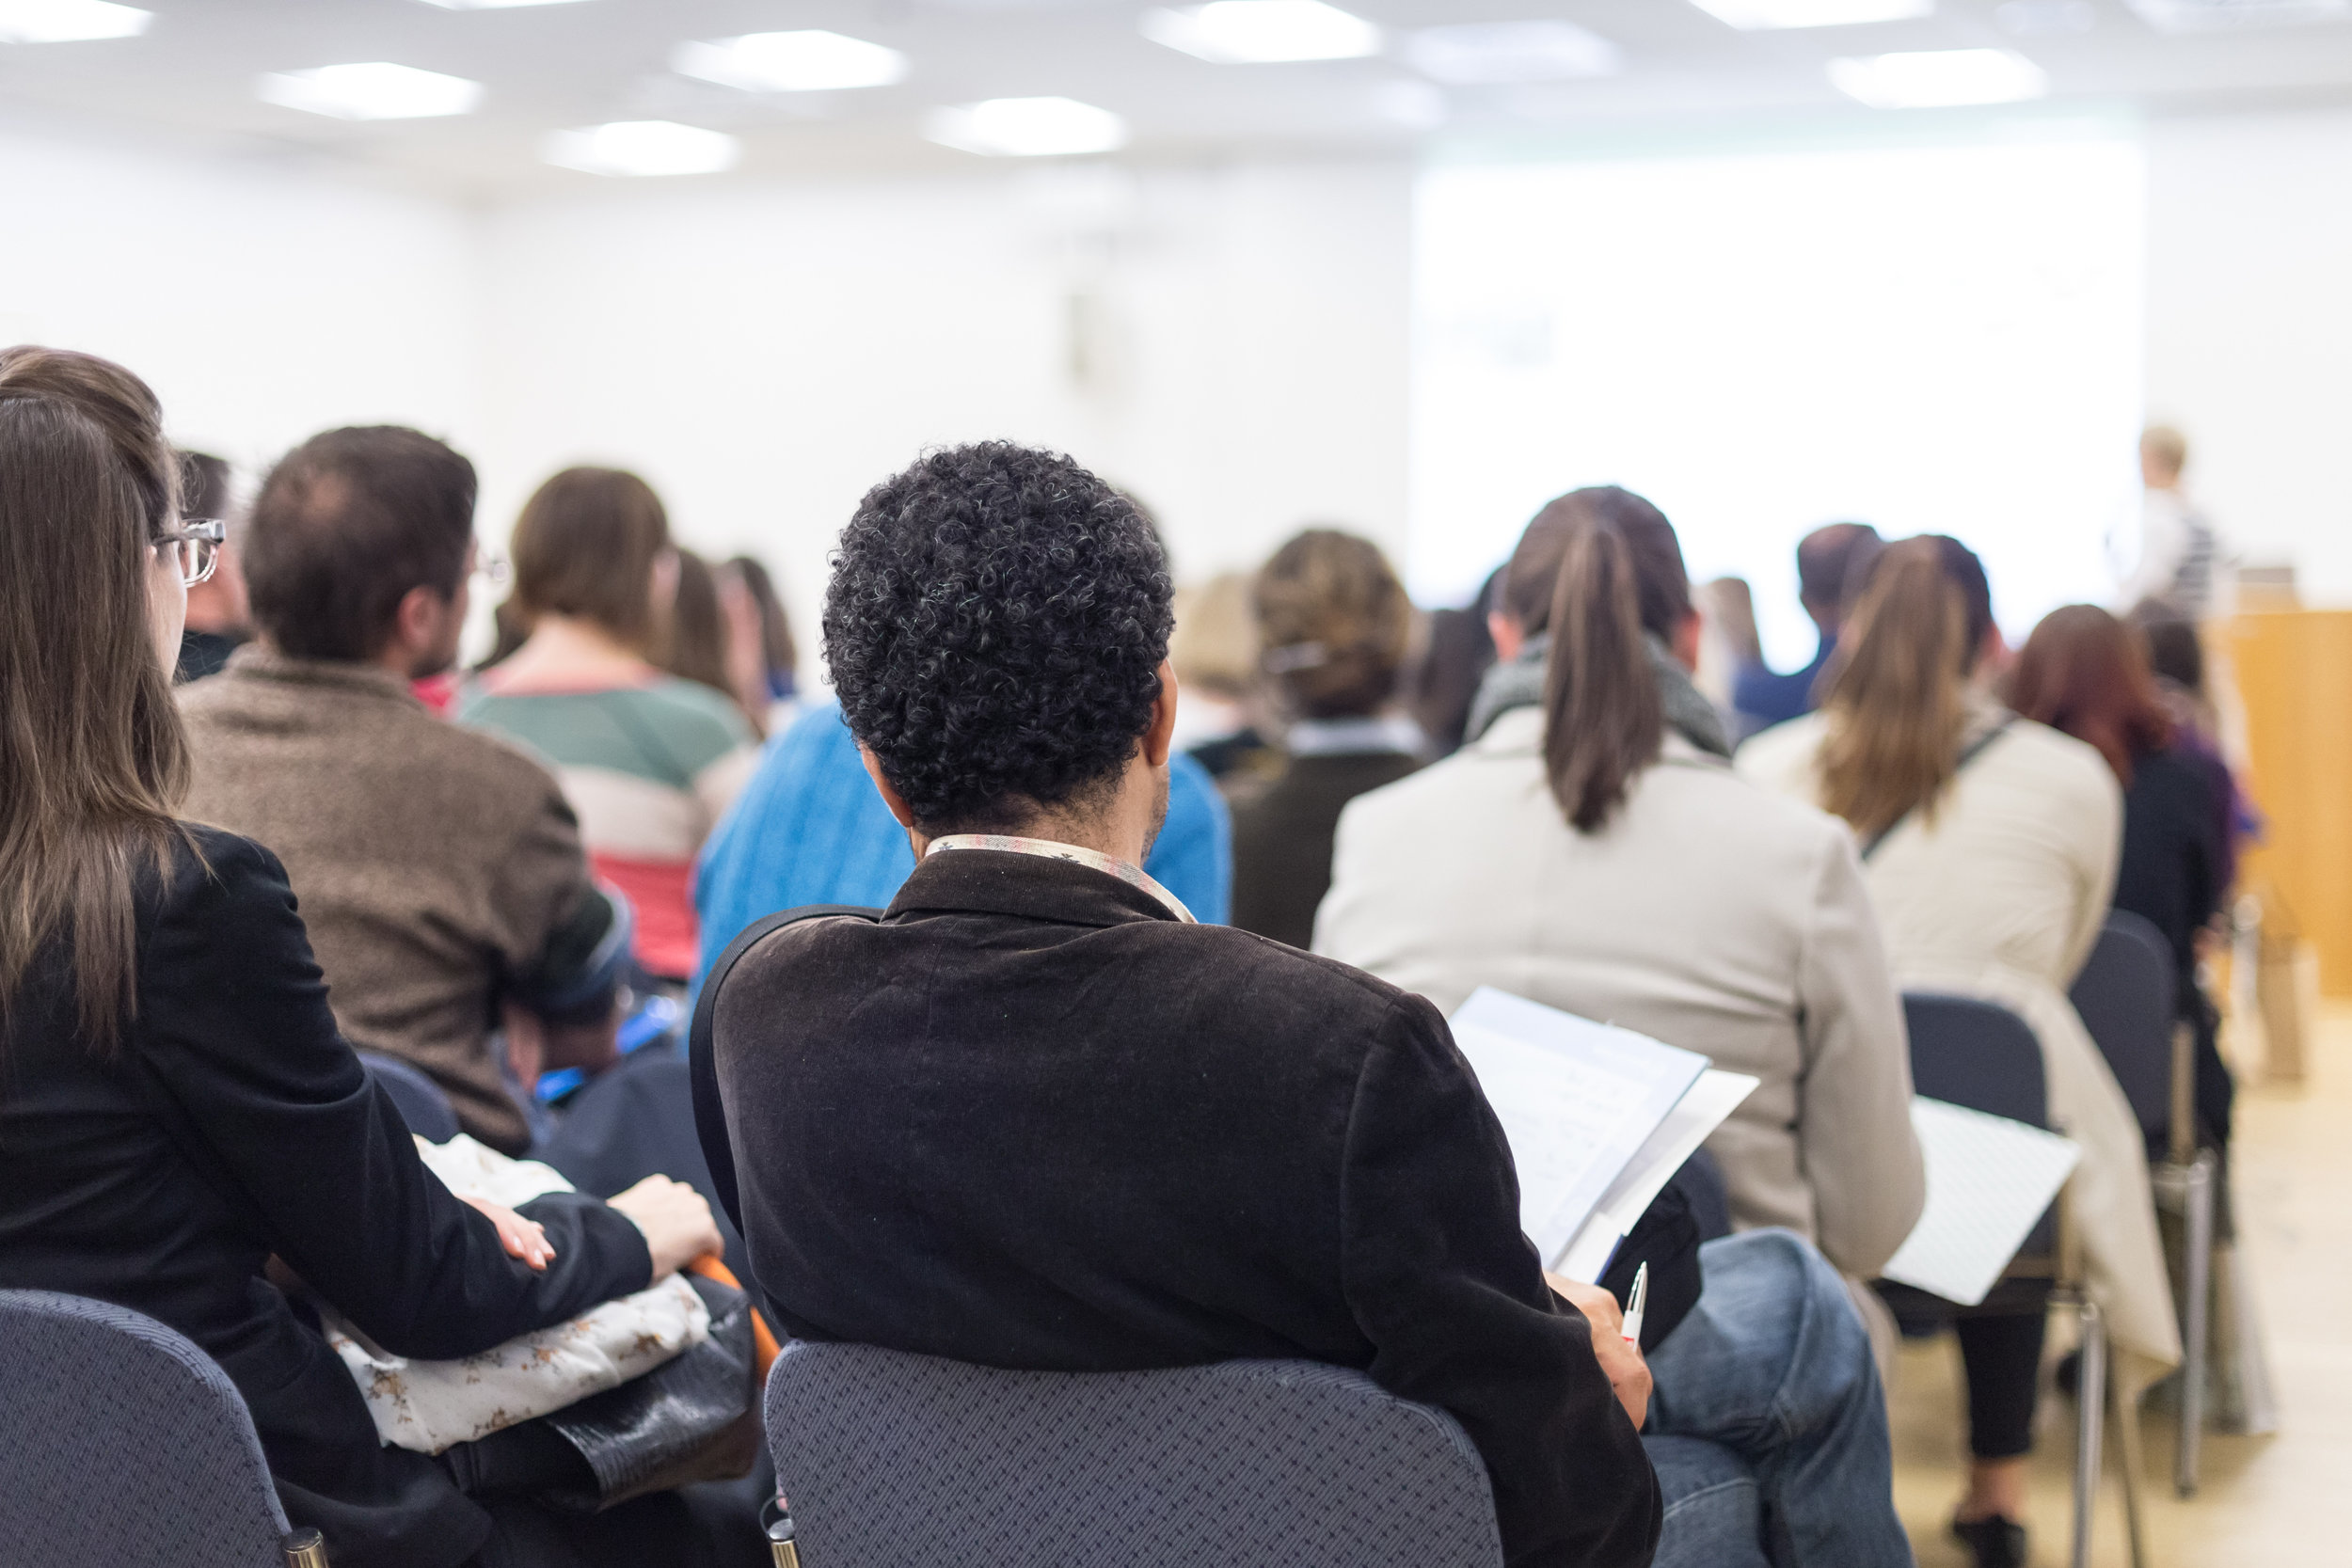 Professionals listen to a speech in a business environment